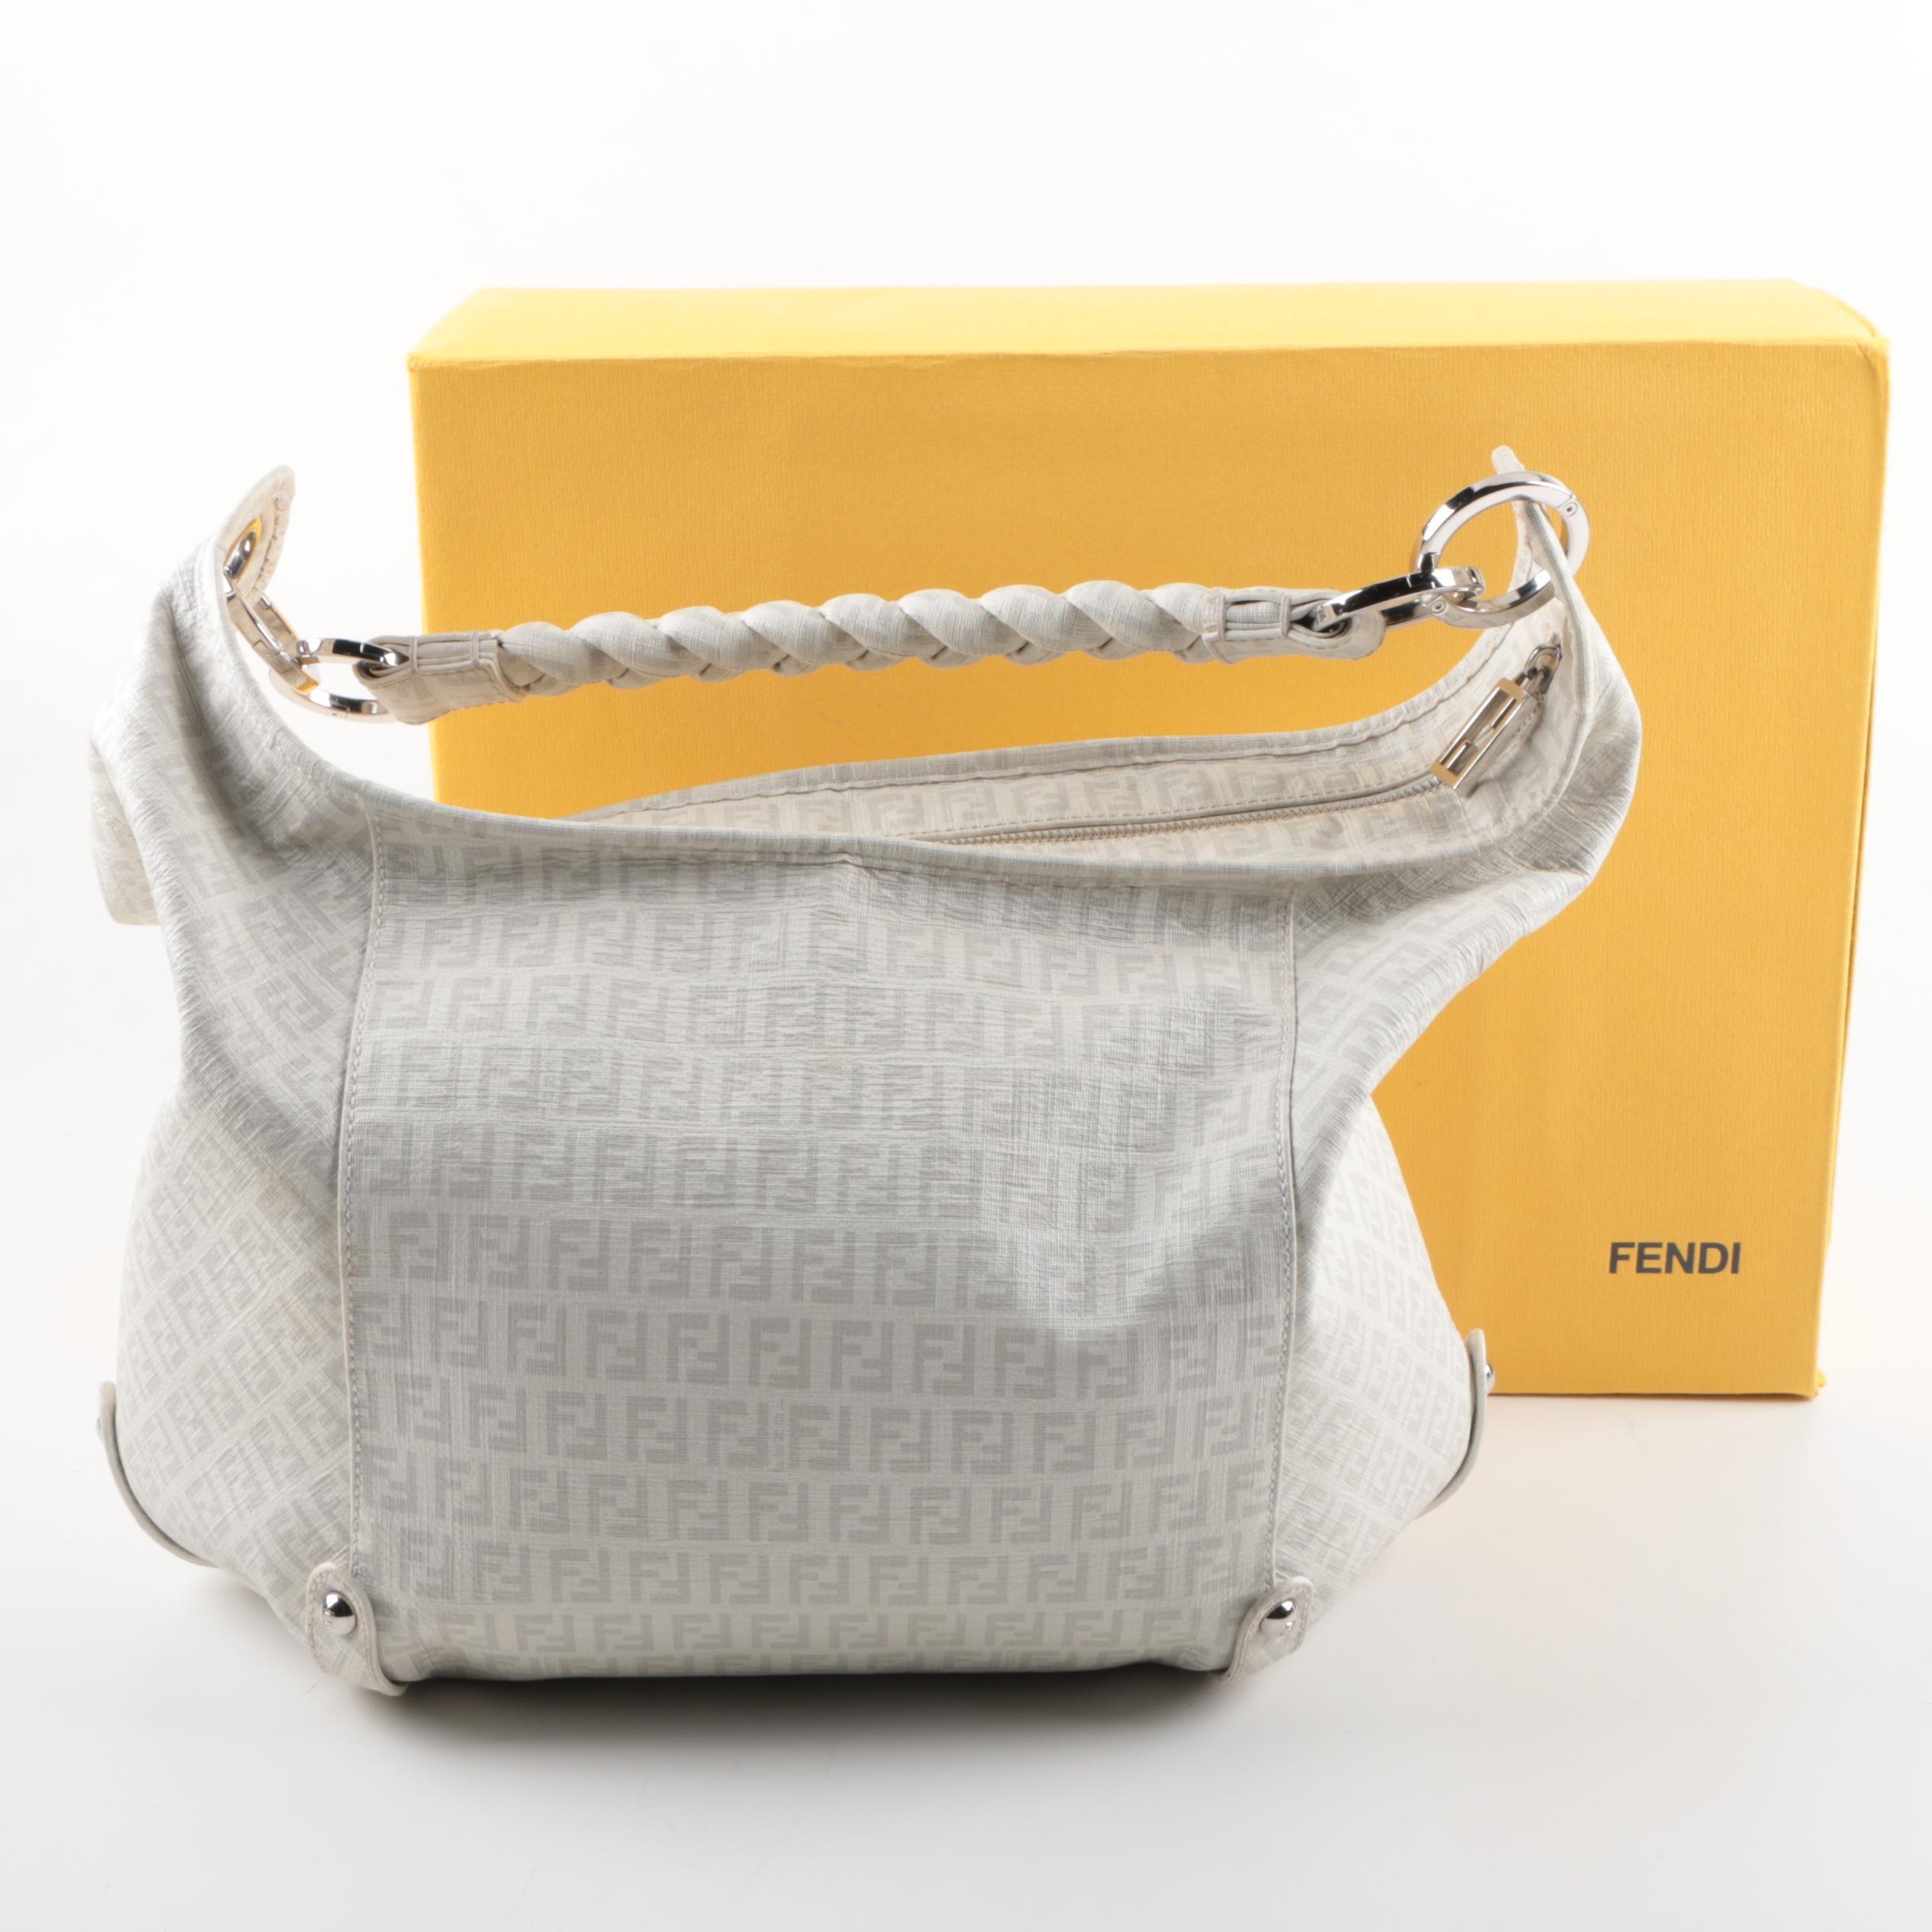 Fendi White and Grey Coated Canvas Hobo Handbag